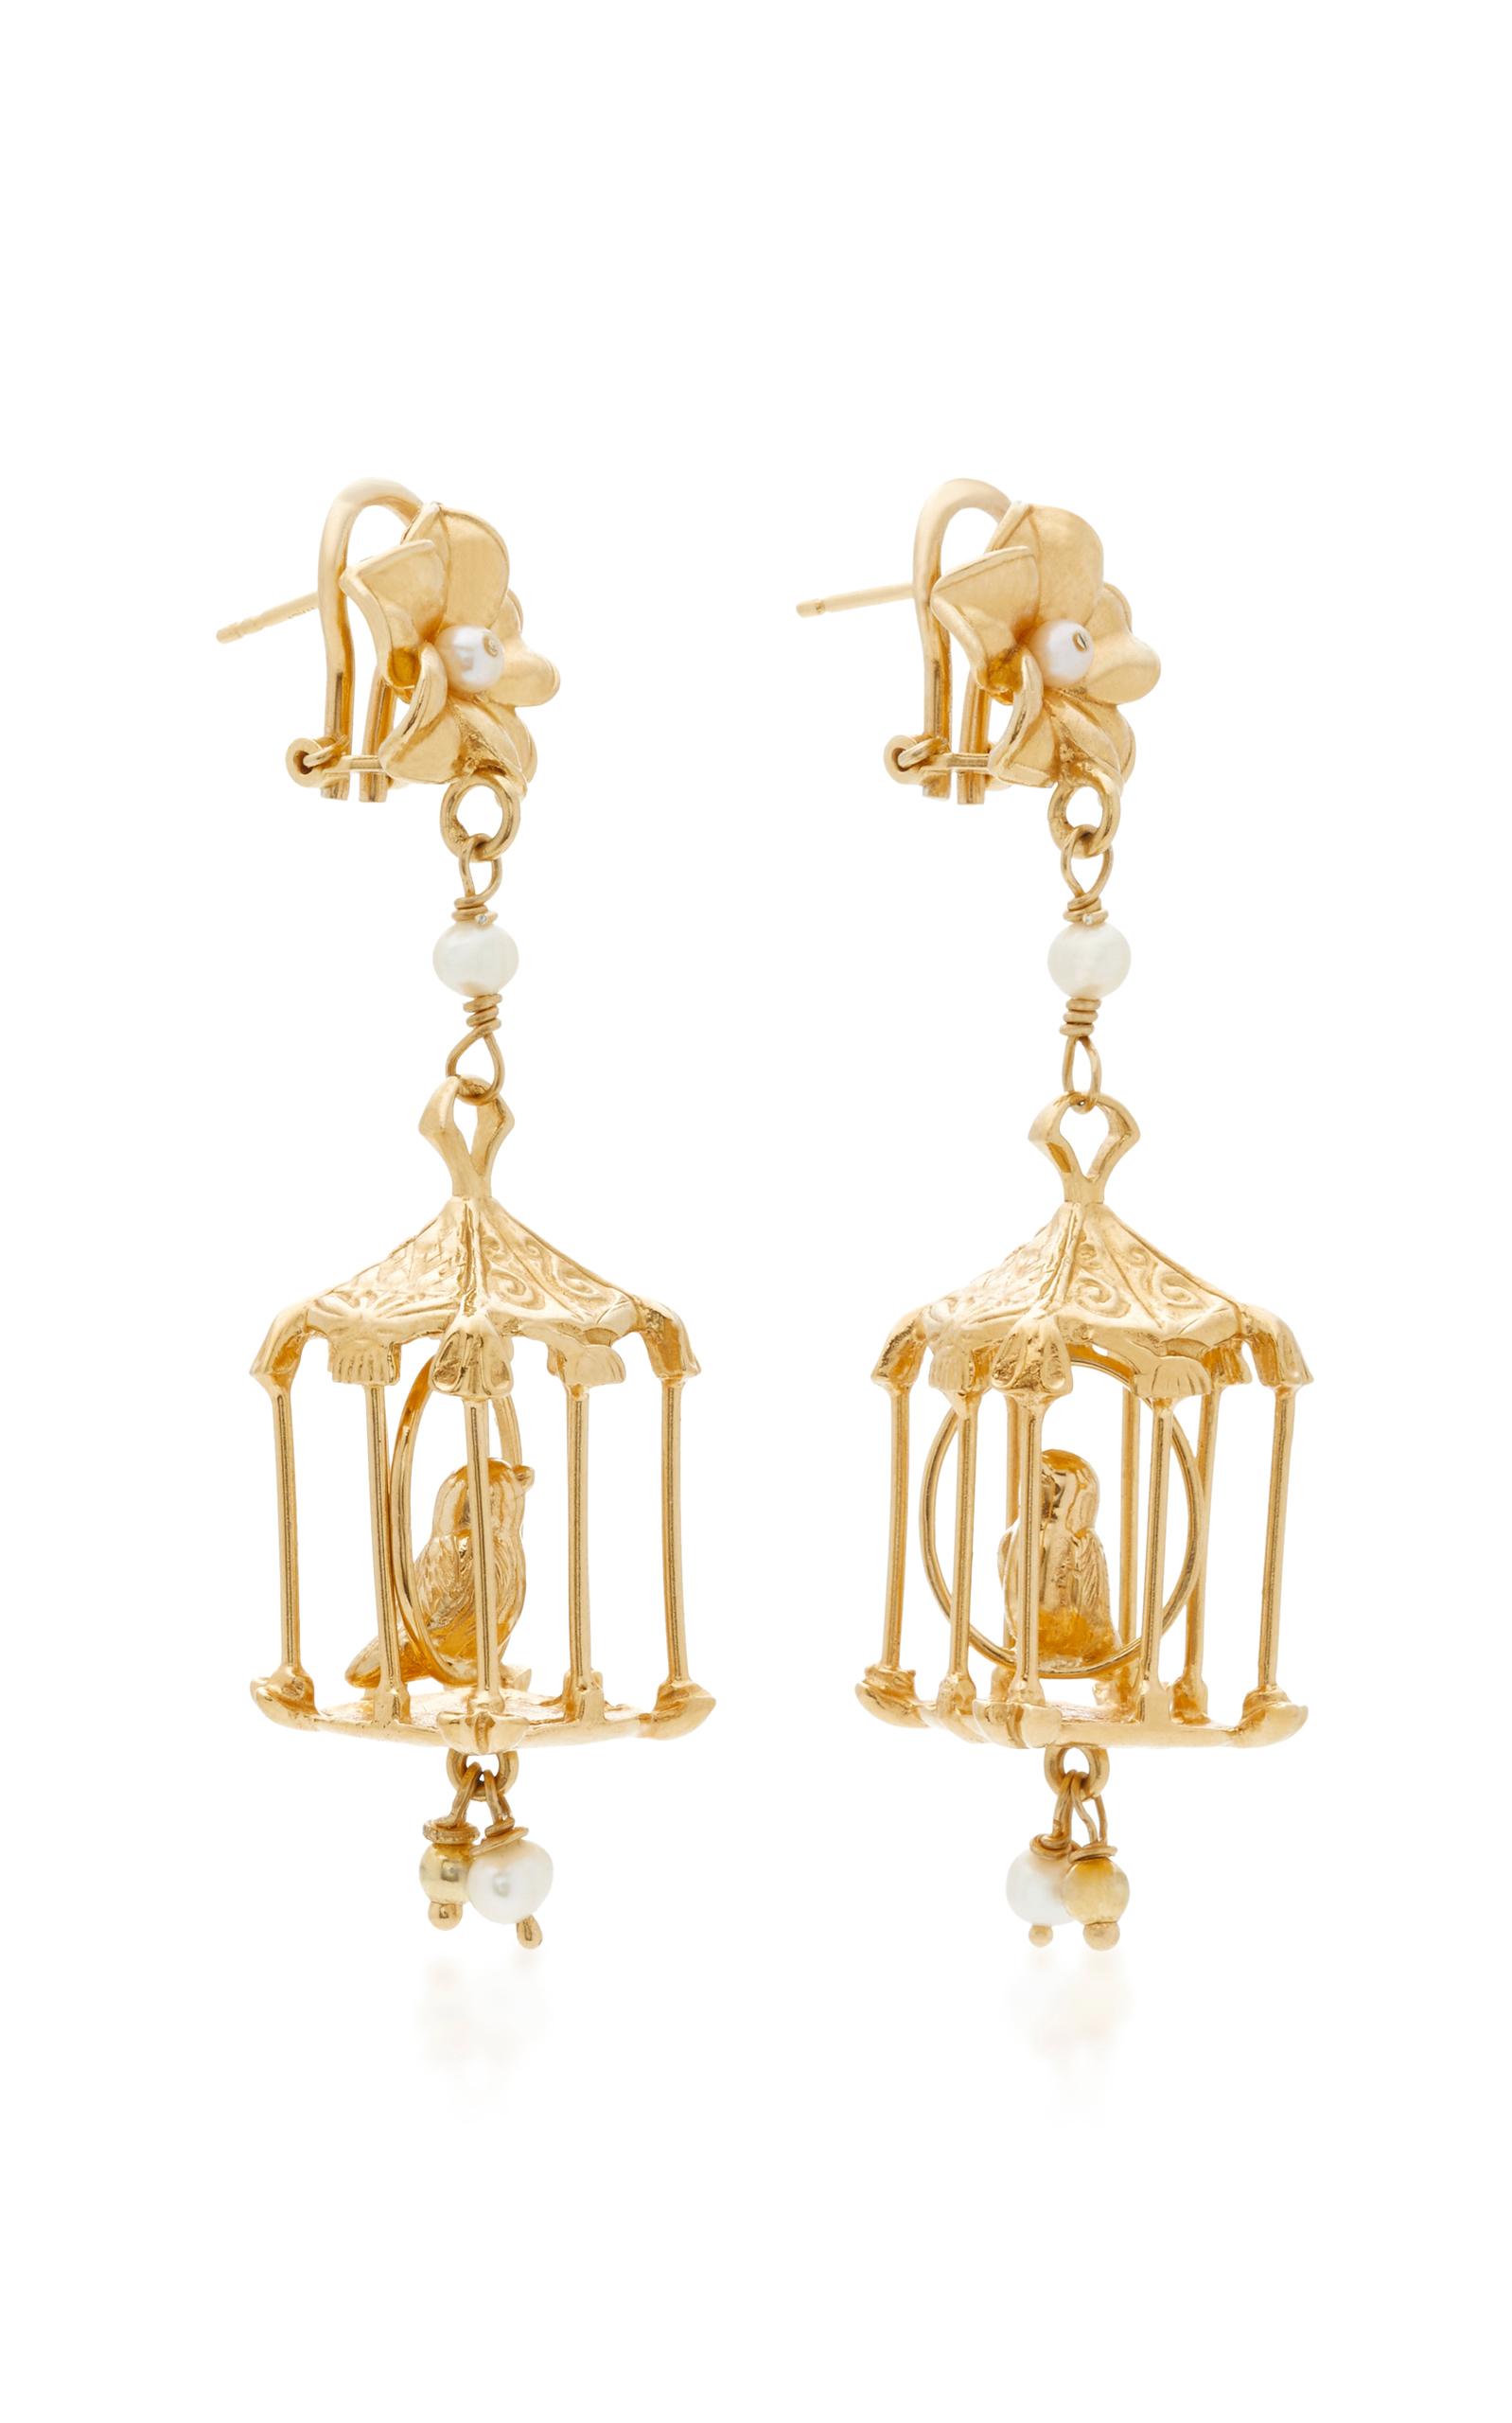 Pagoda 18K Gold Vermeil and Pearl Earrings Of Rare Origin ooZmTC2PjZ